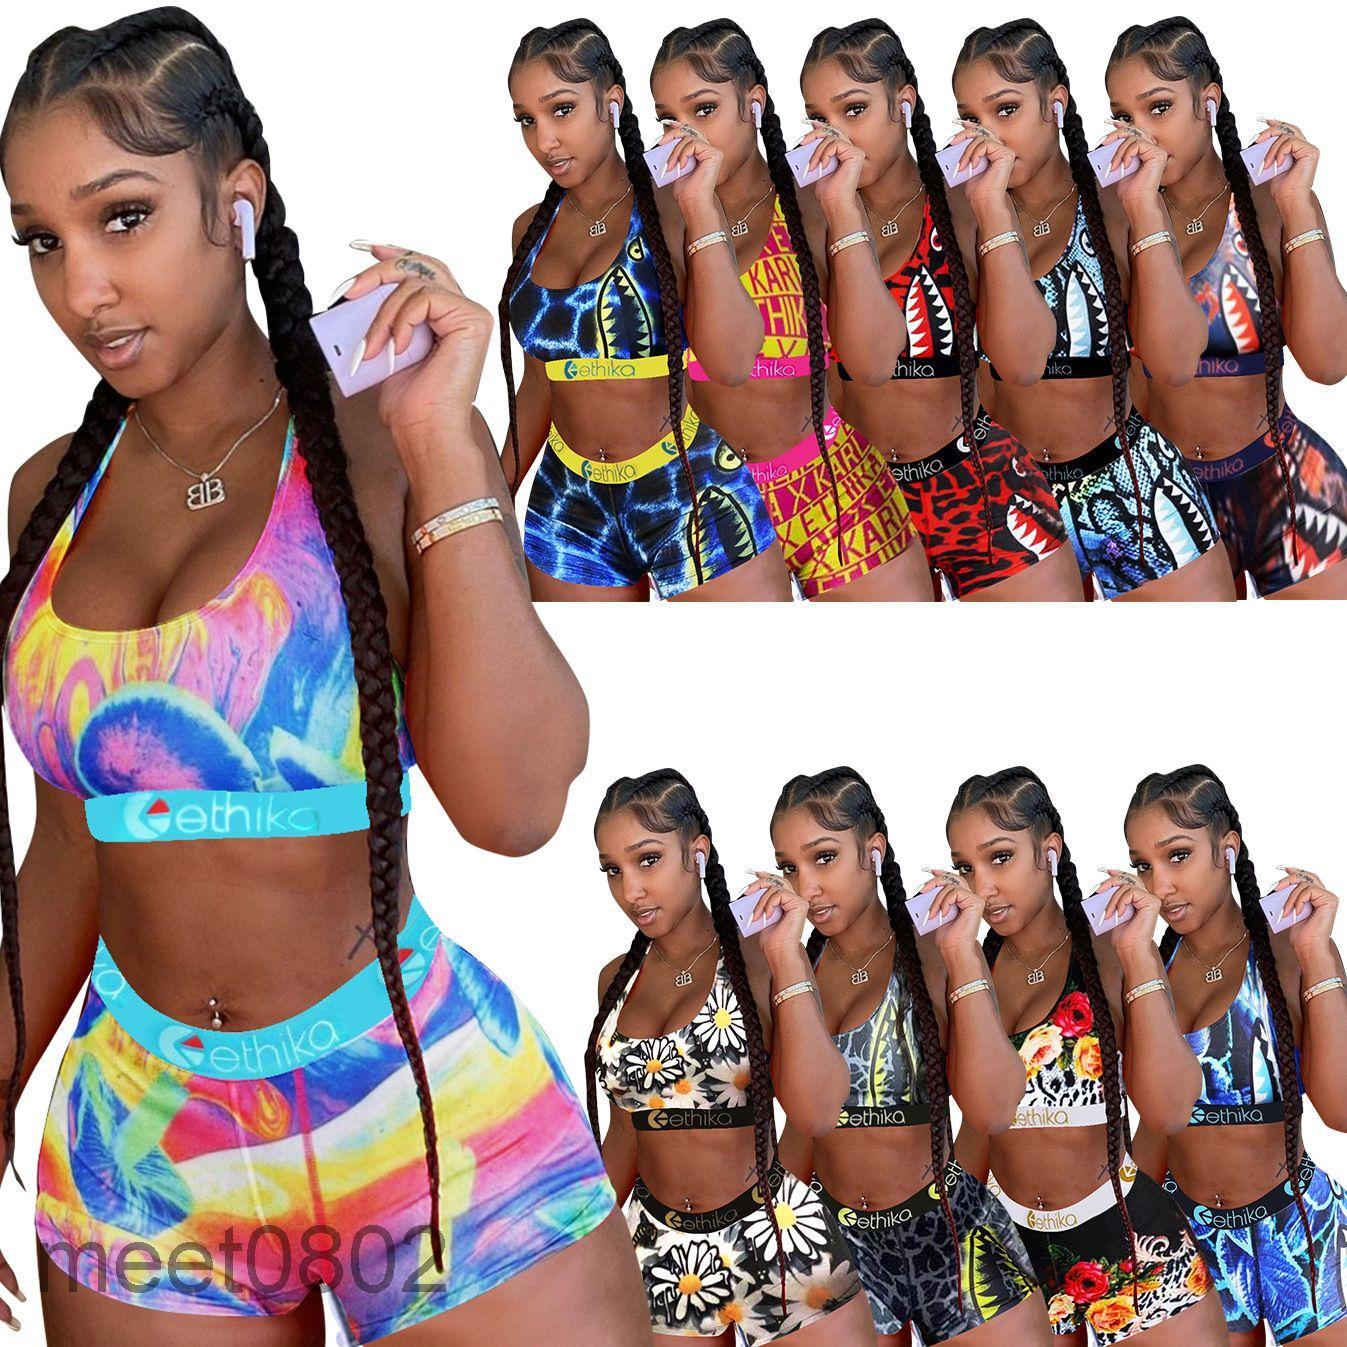 Womens Ethika Swimwear Designer 2021 Two Piece Set Swimsuits Pattern Printed Bikini 10 Color Optional Swimming Suits 9088